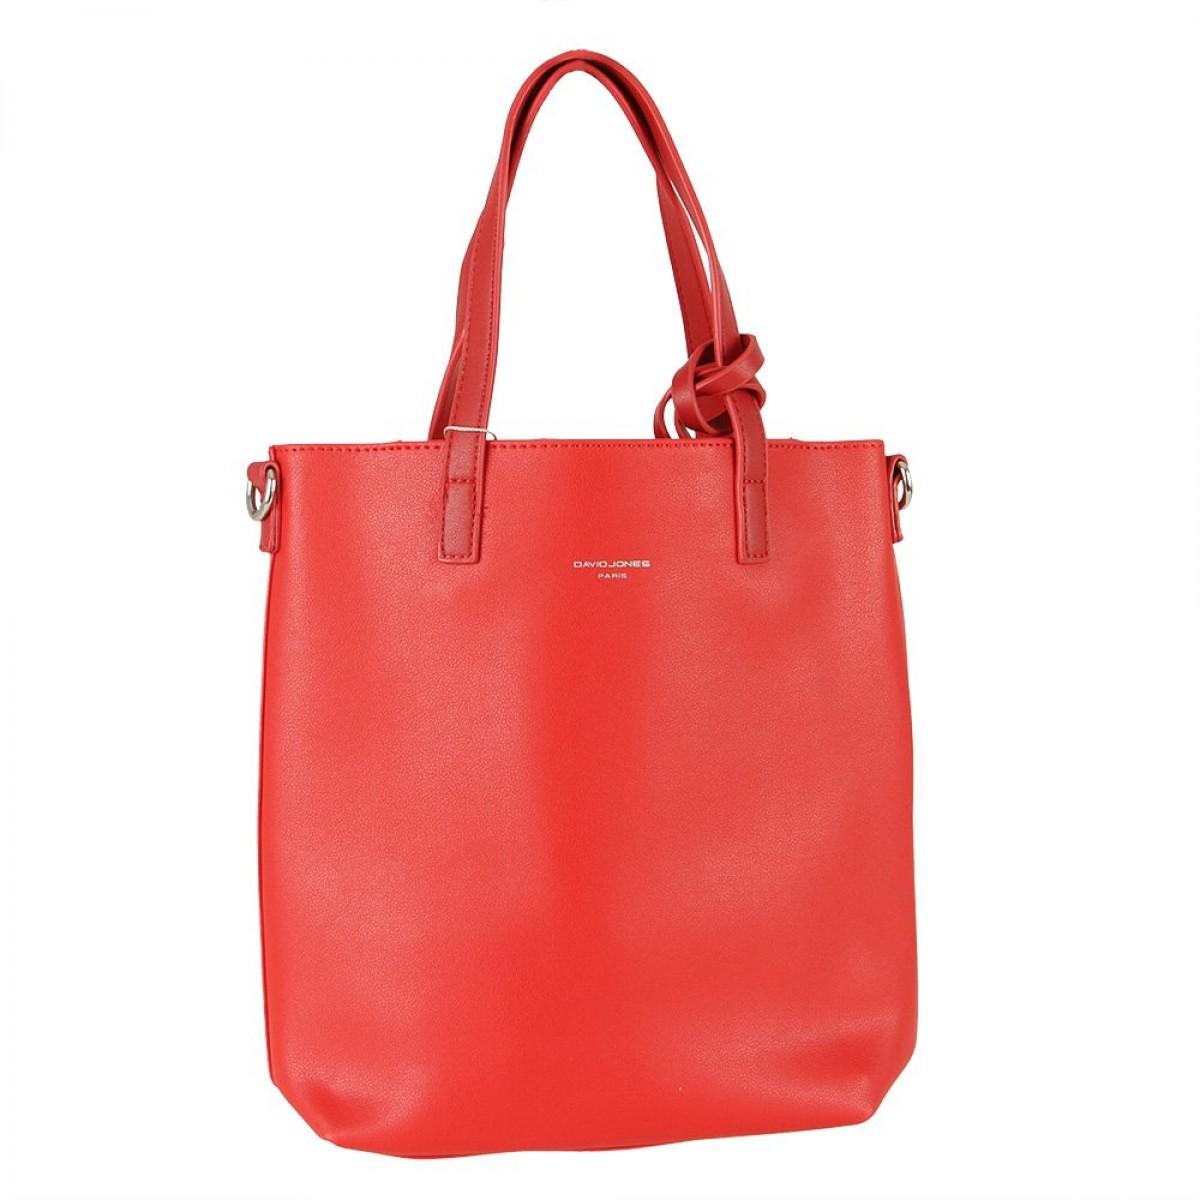 Жіноча сумка David Jones 6291-1 RED